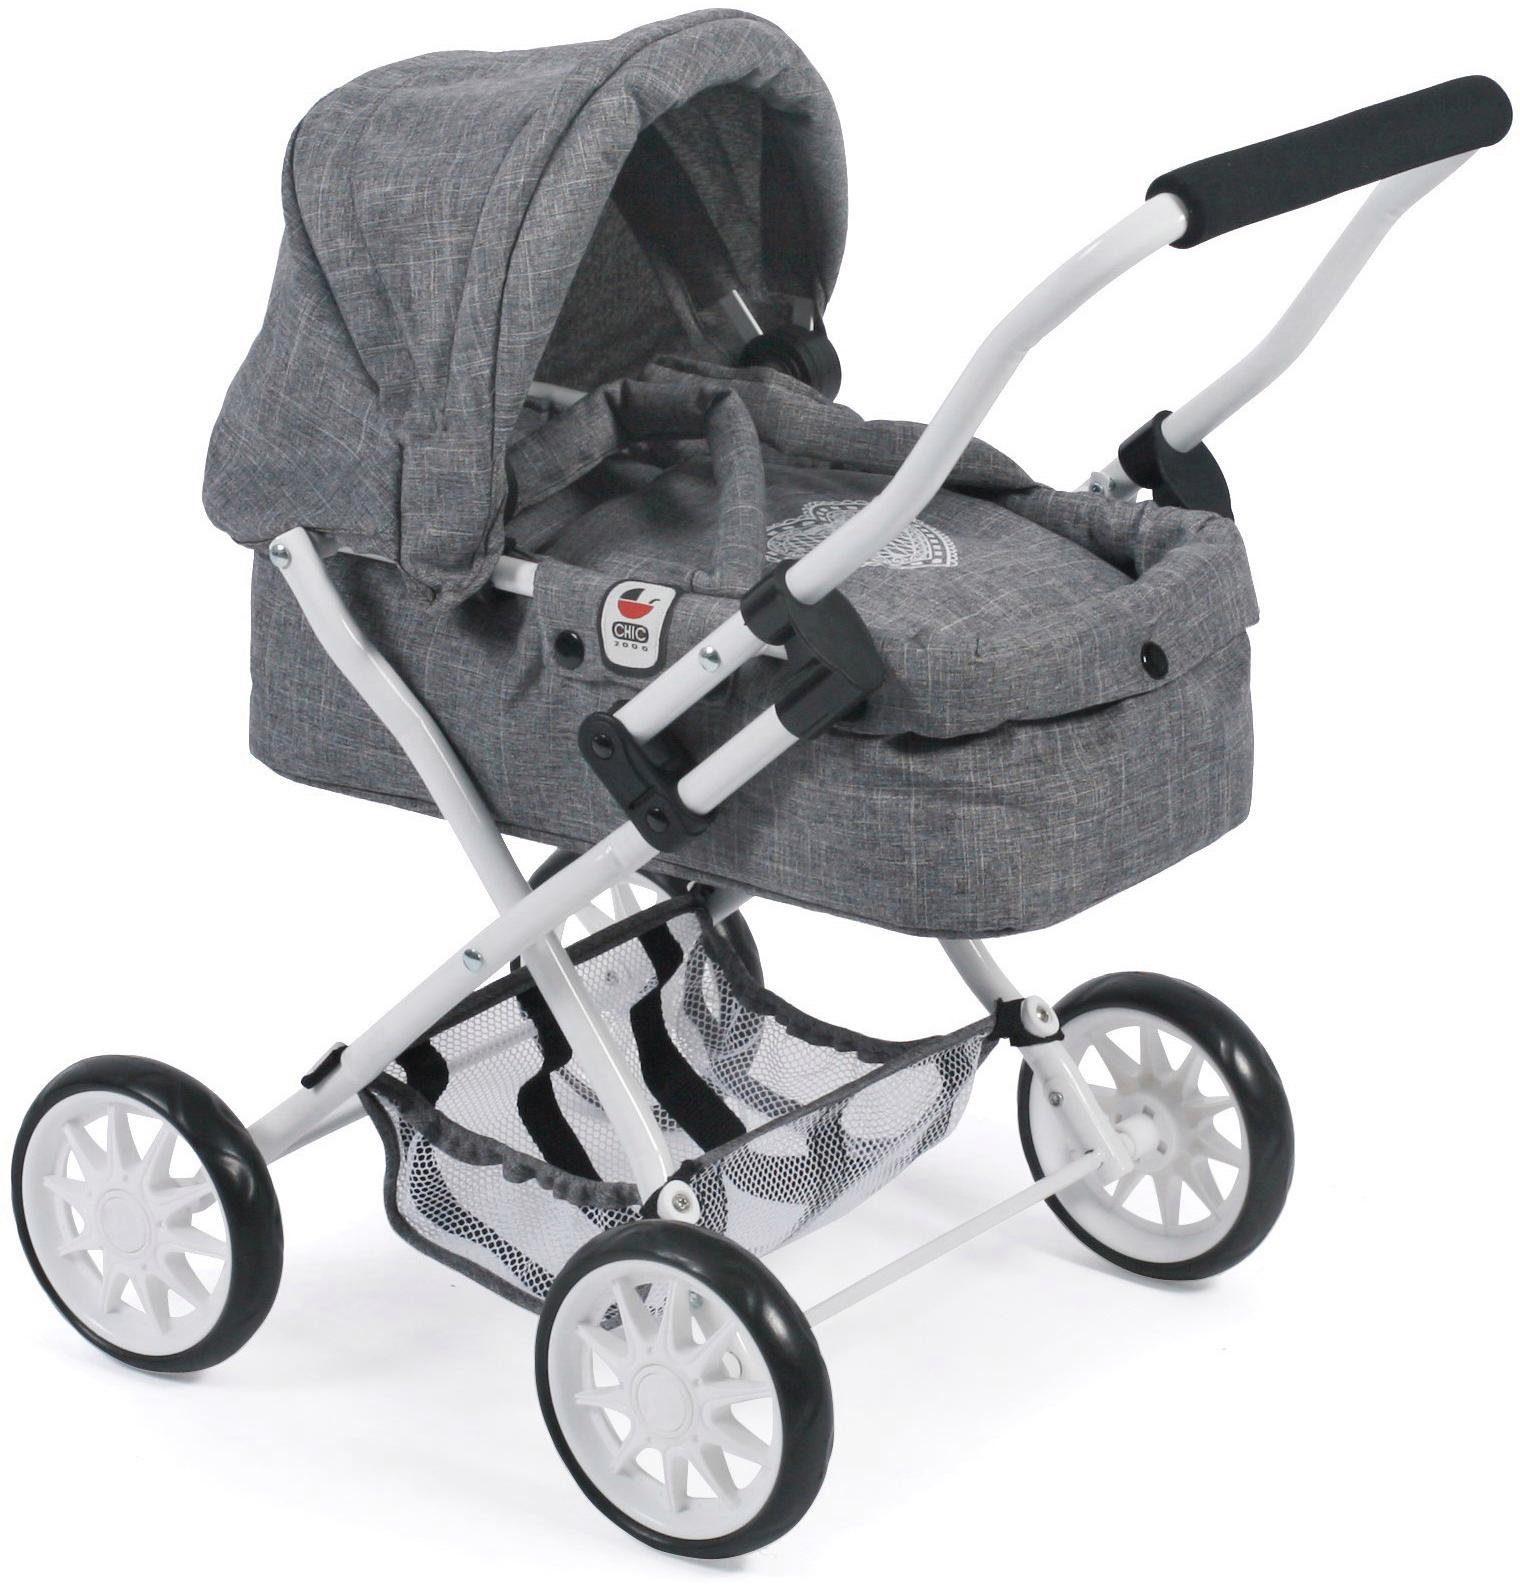 CHIC2000 Mini Puppenwagen mit herausnehmbarer Tragetasche, »Smarty, Jeans Grey«